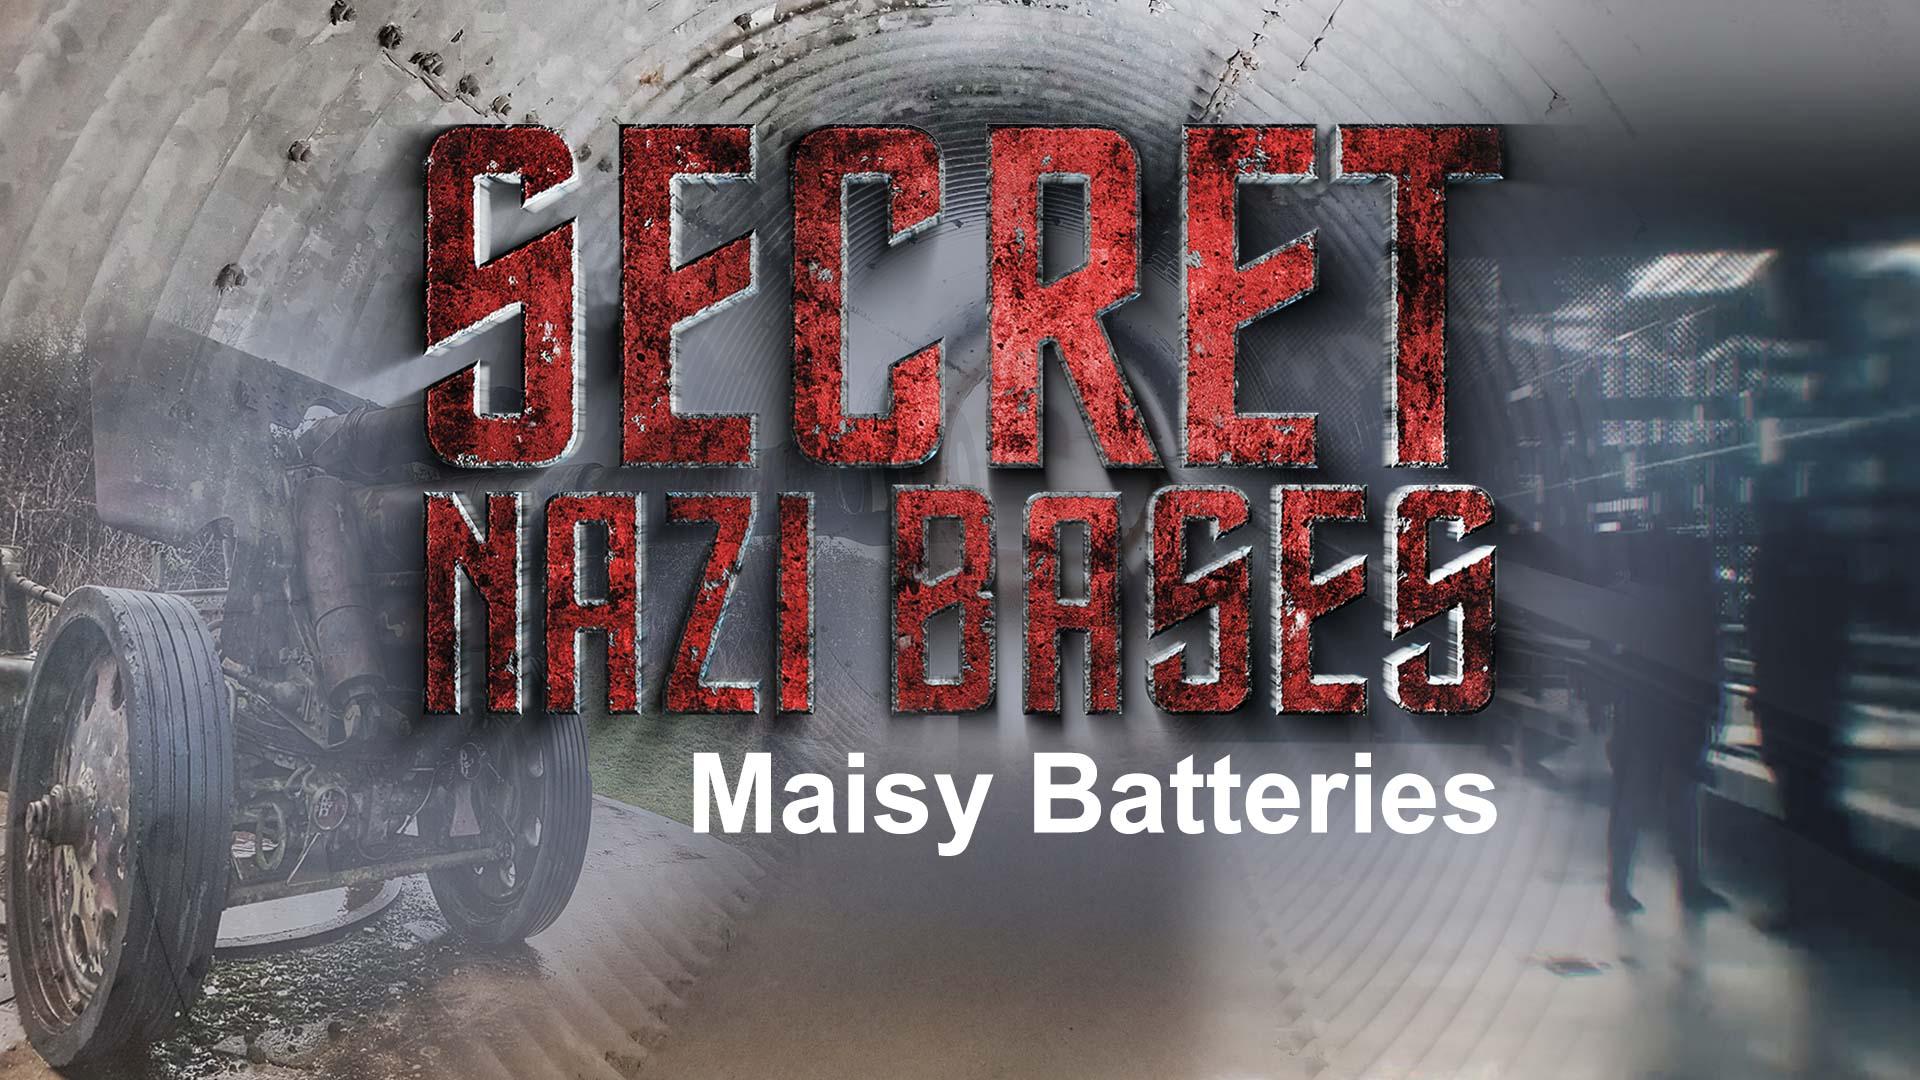 Secret Nazi Bases: Maisy Batteries